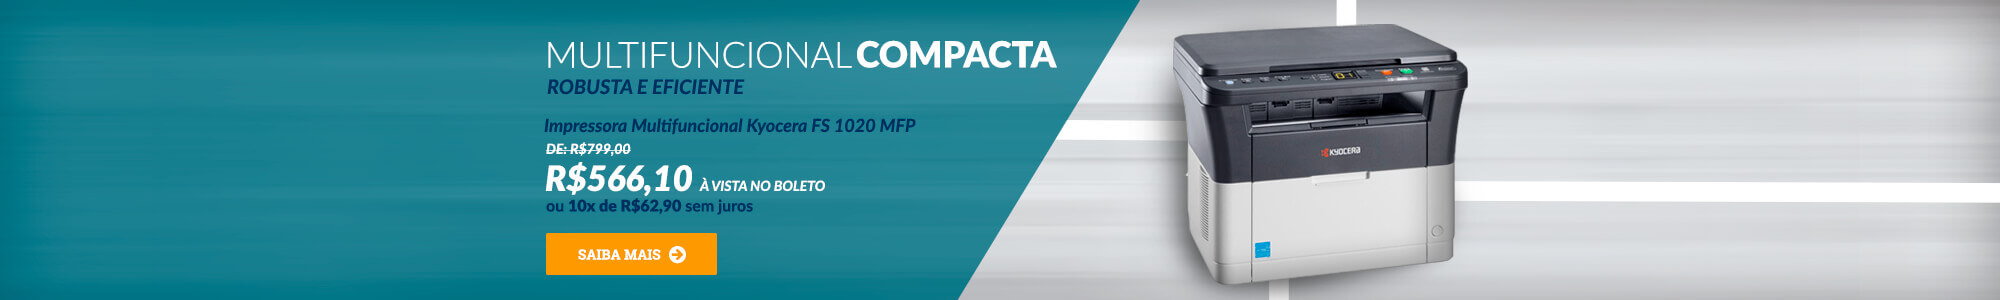 Banner ICOM - Kyocera 1020 b